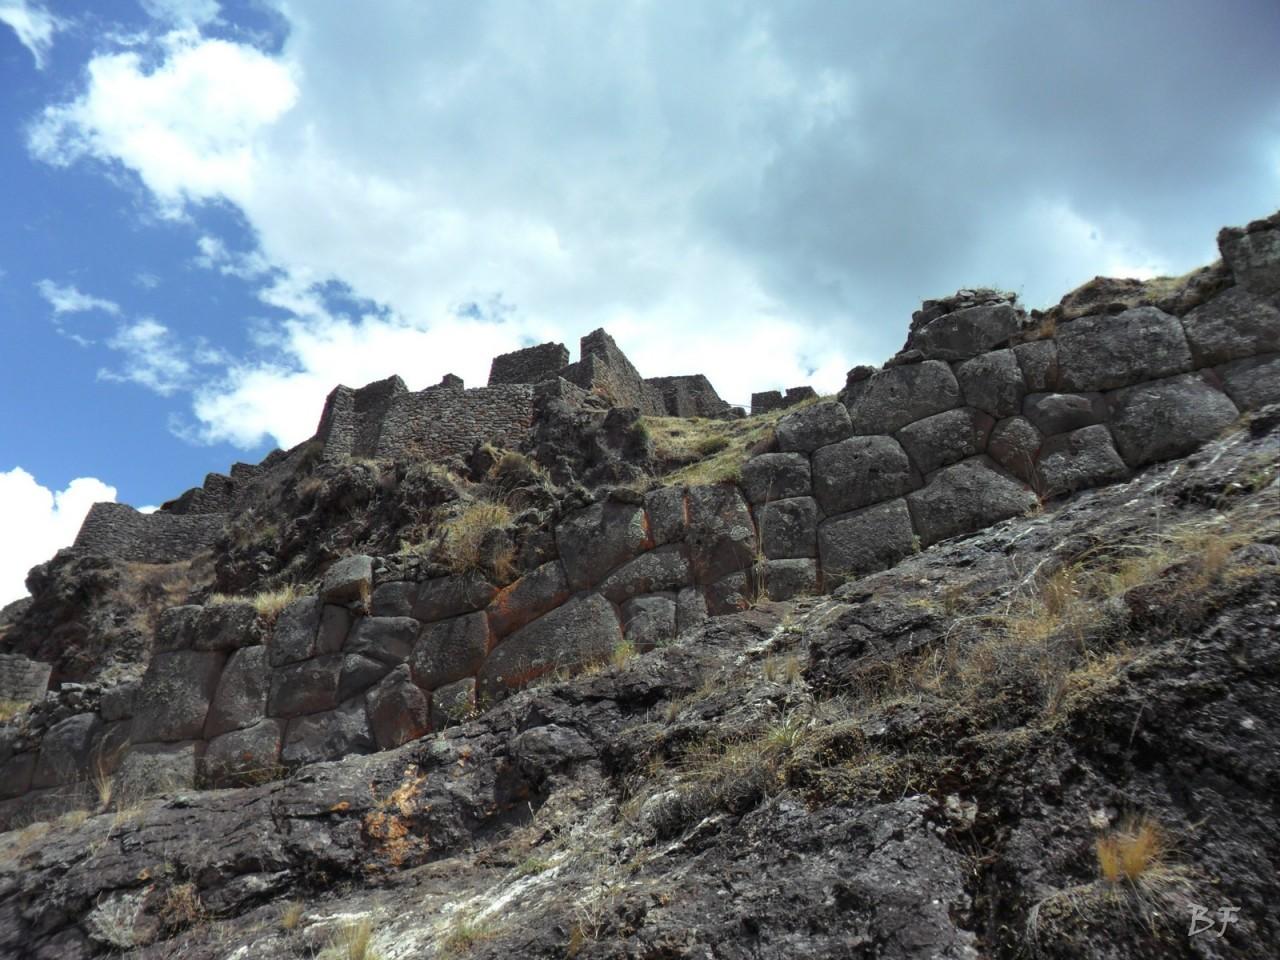 Mura-Poligonali-Megaliti-Altari-Rupestri-Pisac-Cusco-Perù-25